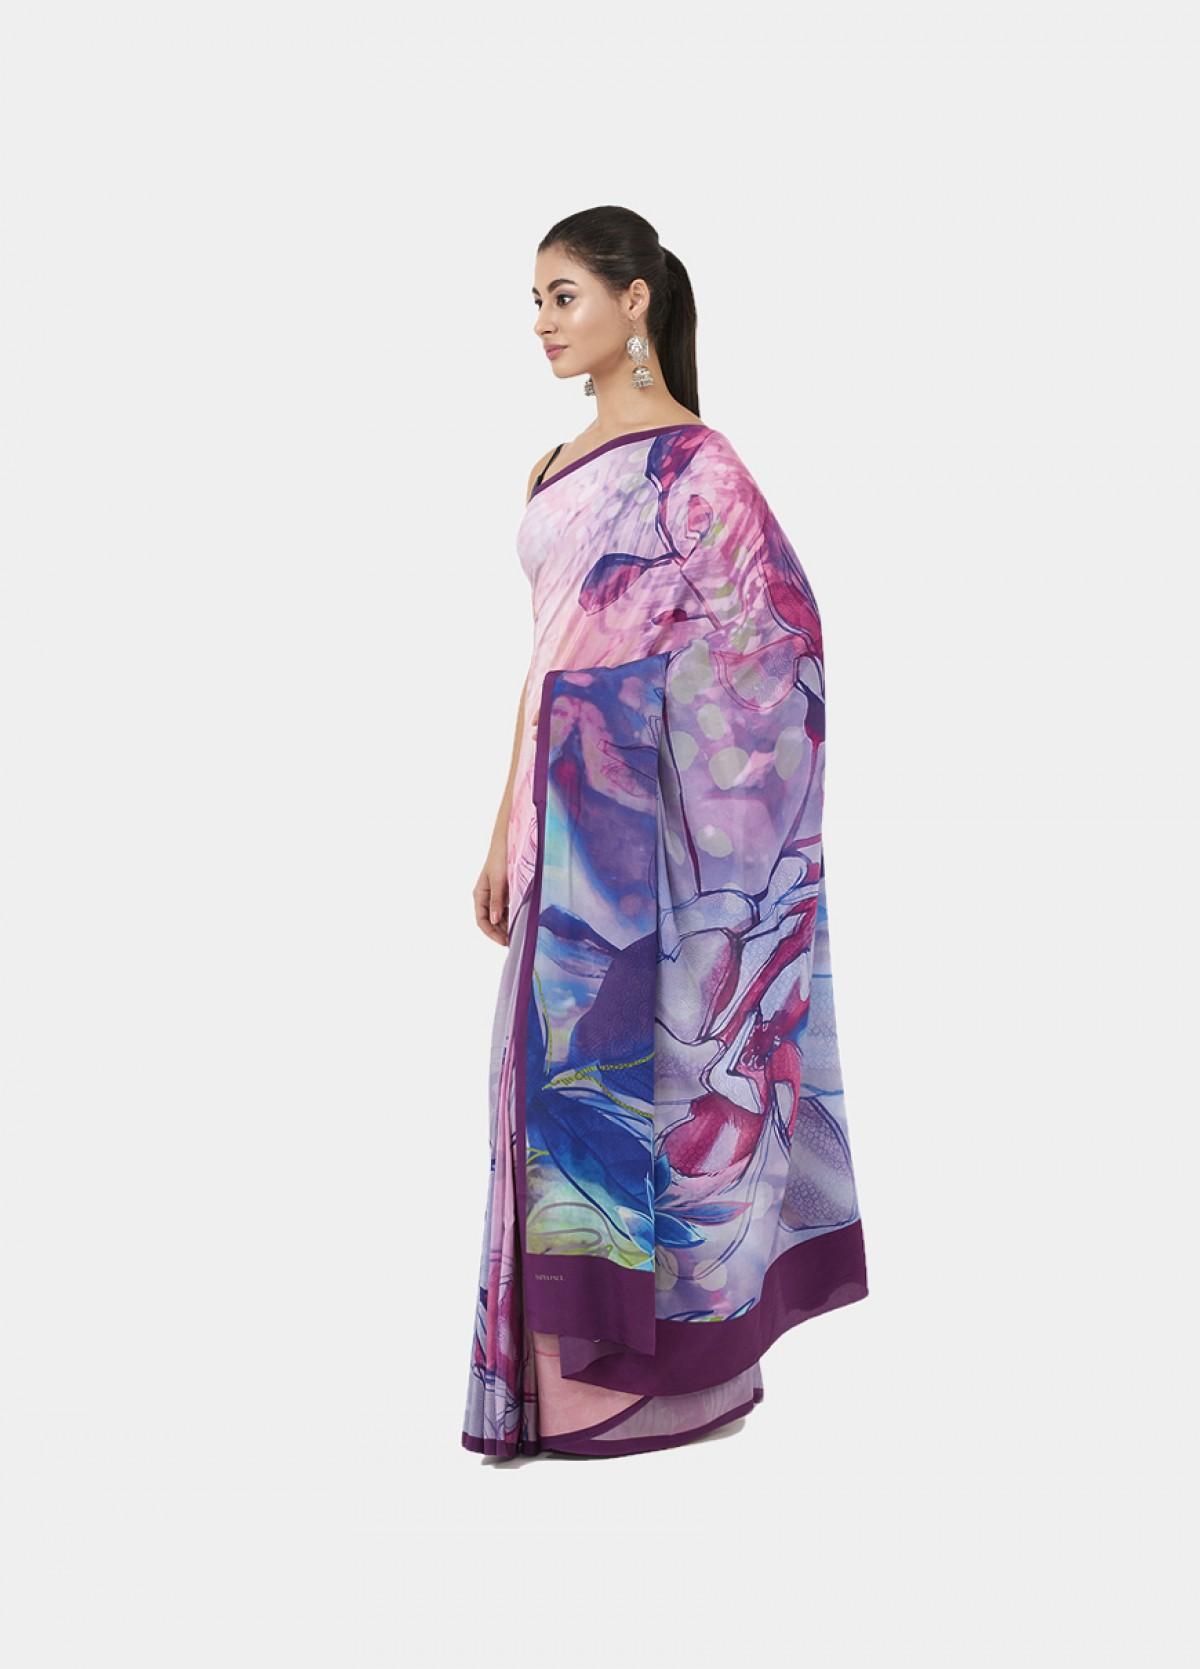 The Nag Champa Sari